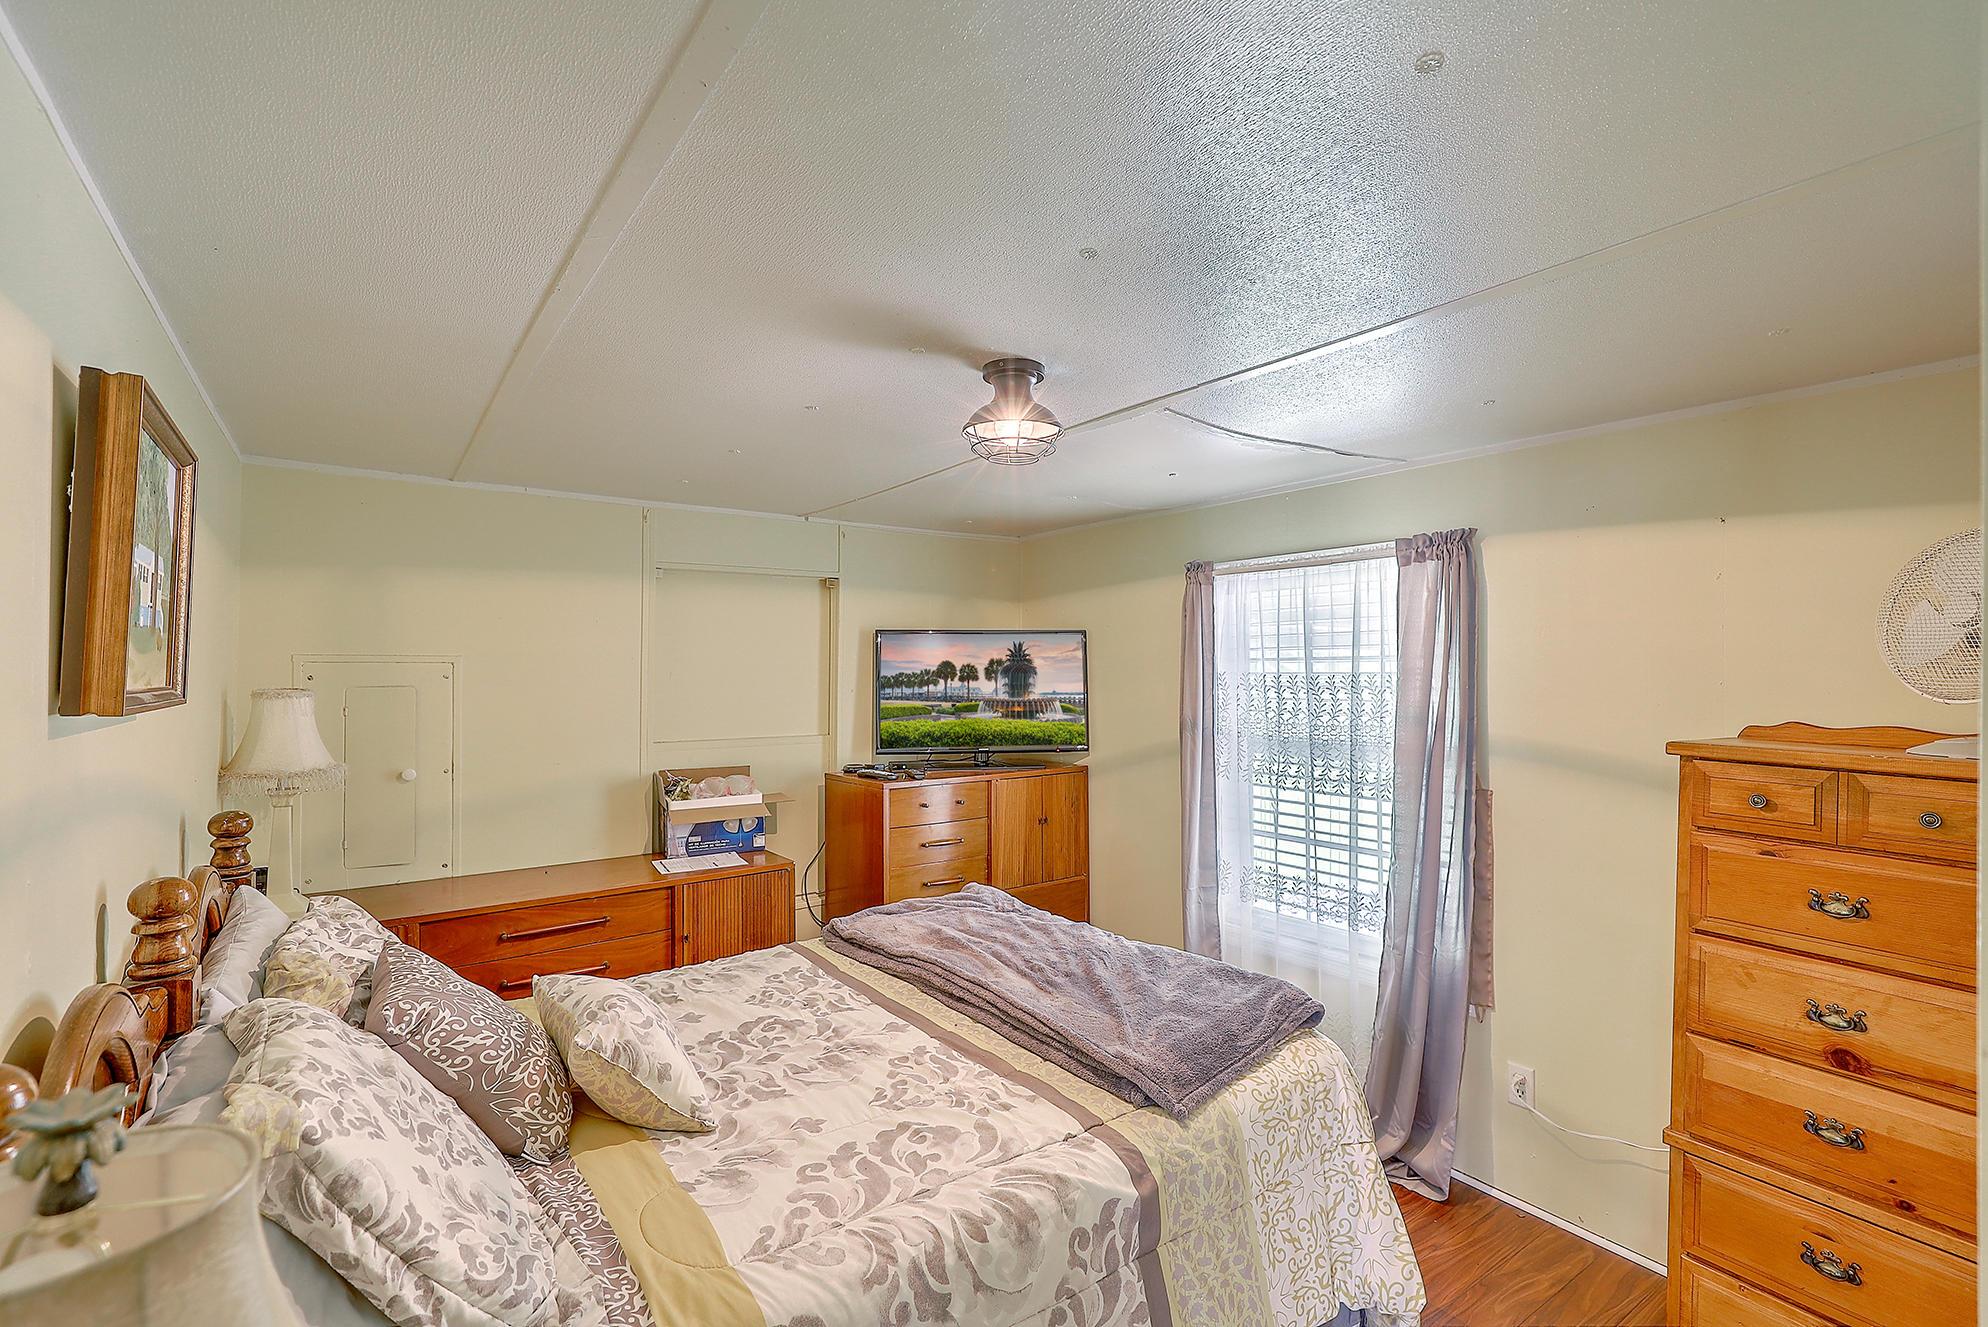 Cross Area (West) Homes For Sale - 128 Cherry Grove, Cross, SC - 17